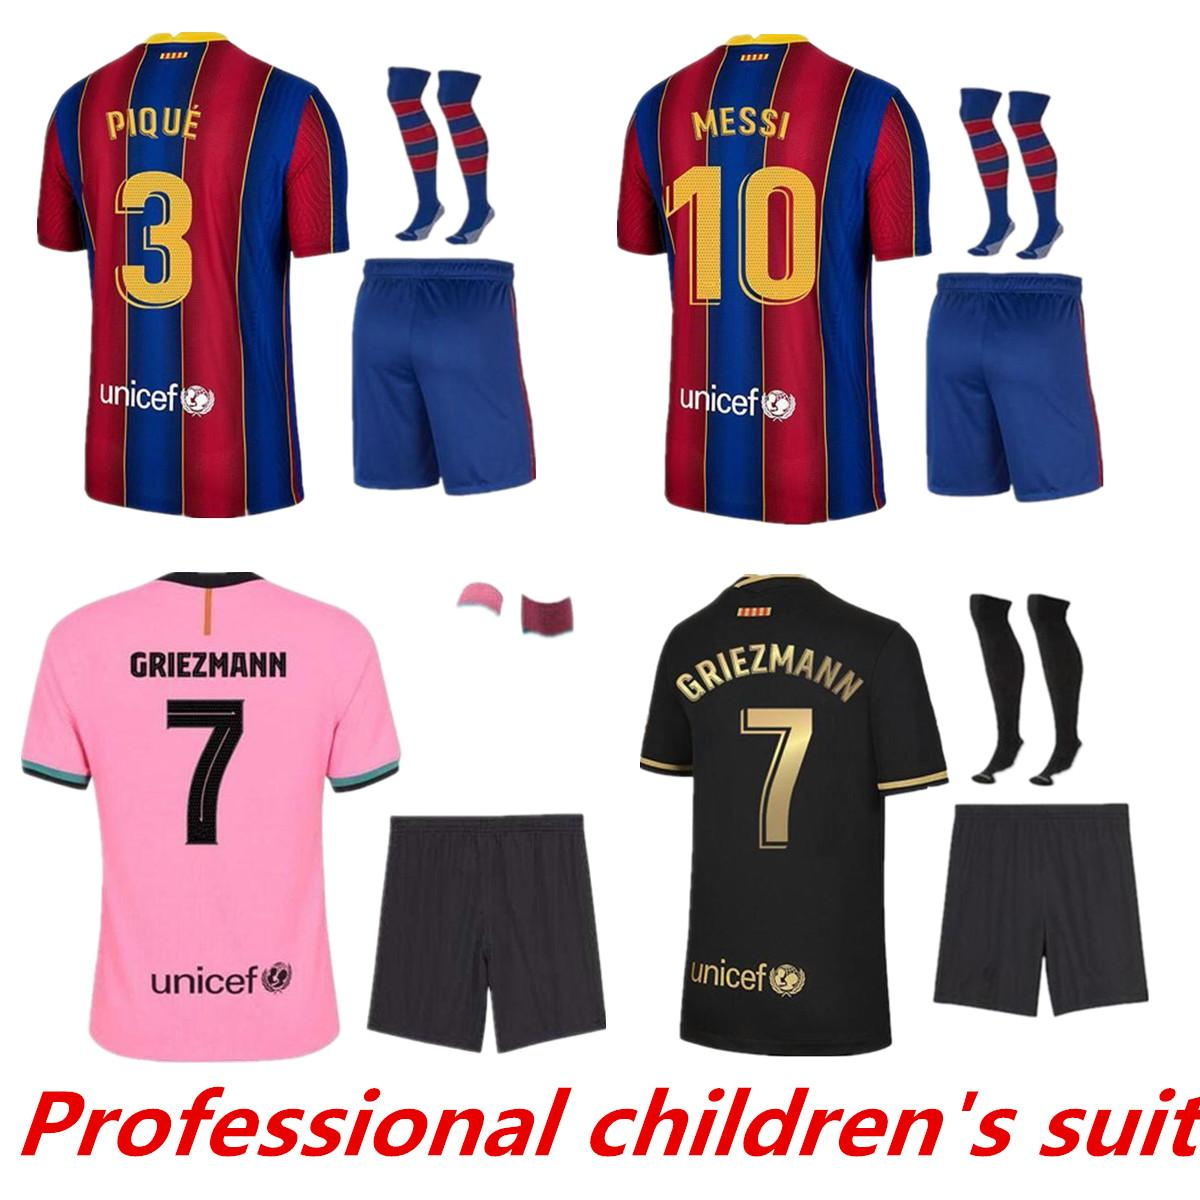 Barcelona Kit Kit Fútbol Jersey Barca 20 21 22 Messi Griezmann Camiseta Futbol Ansu Fati 202 Fde Jong Manga larga Maillots de Fútbol Conjuntos Jerseys